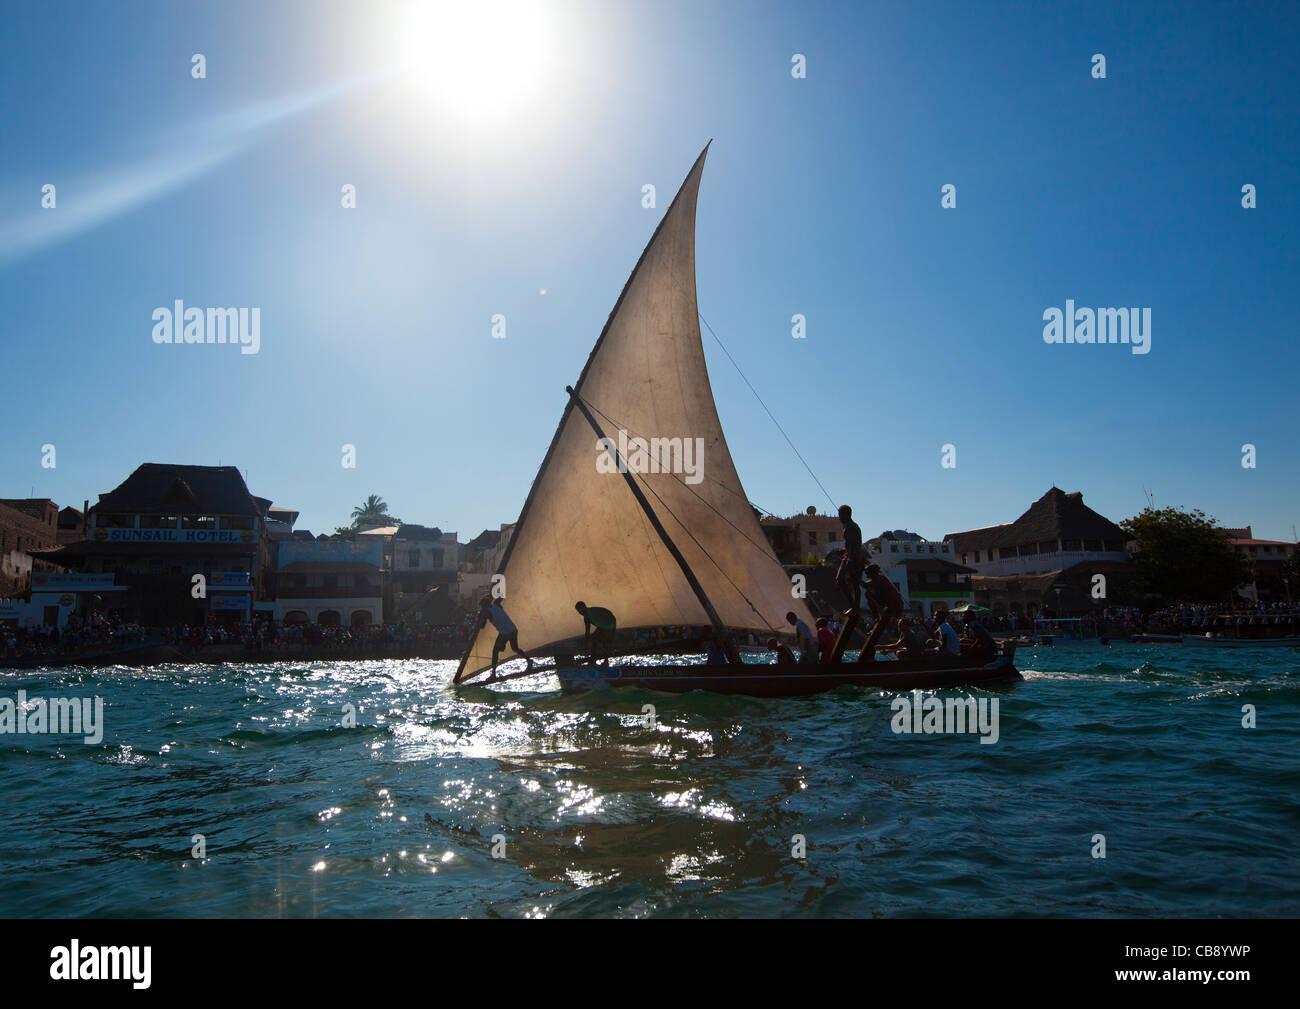 Steerage Of Dhow During The Dhow Race, Maulidi Festival, Lamu, Kenya Stock Photo